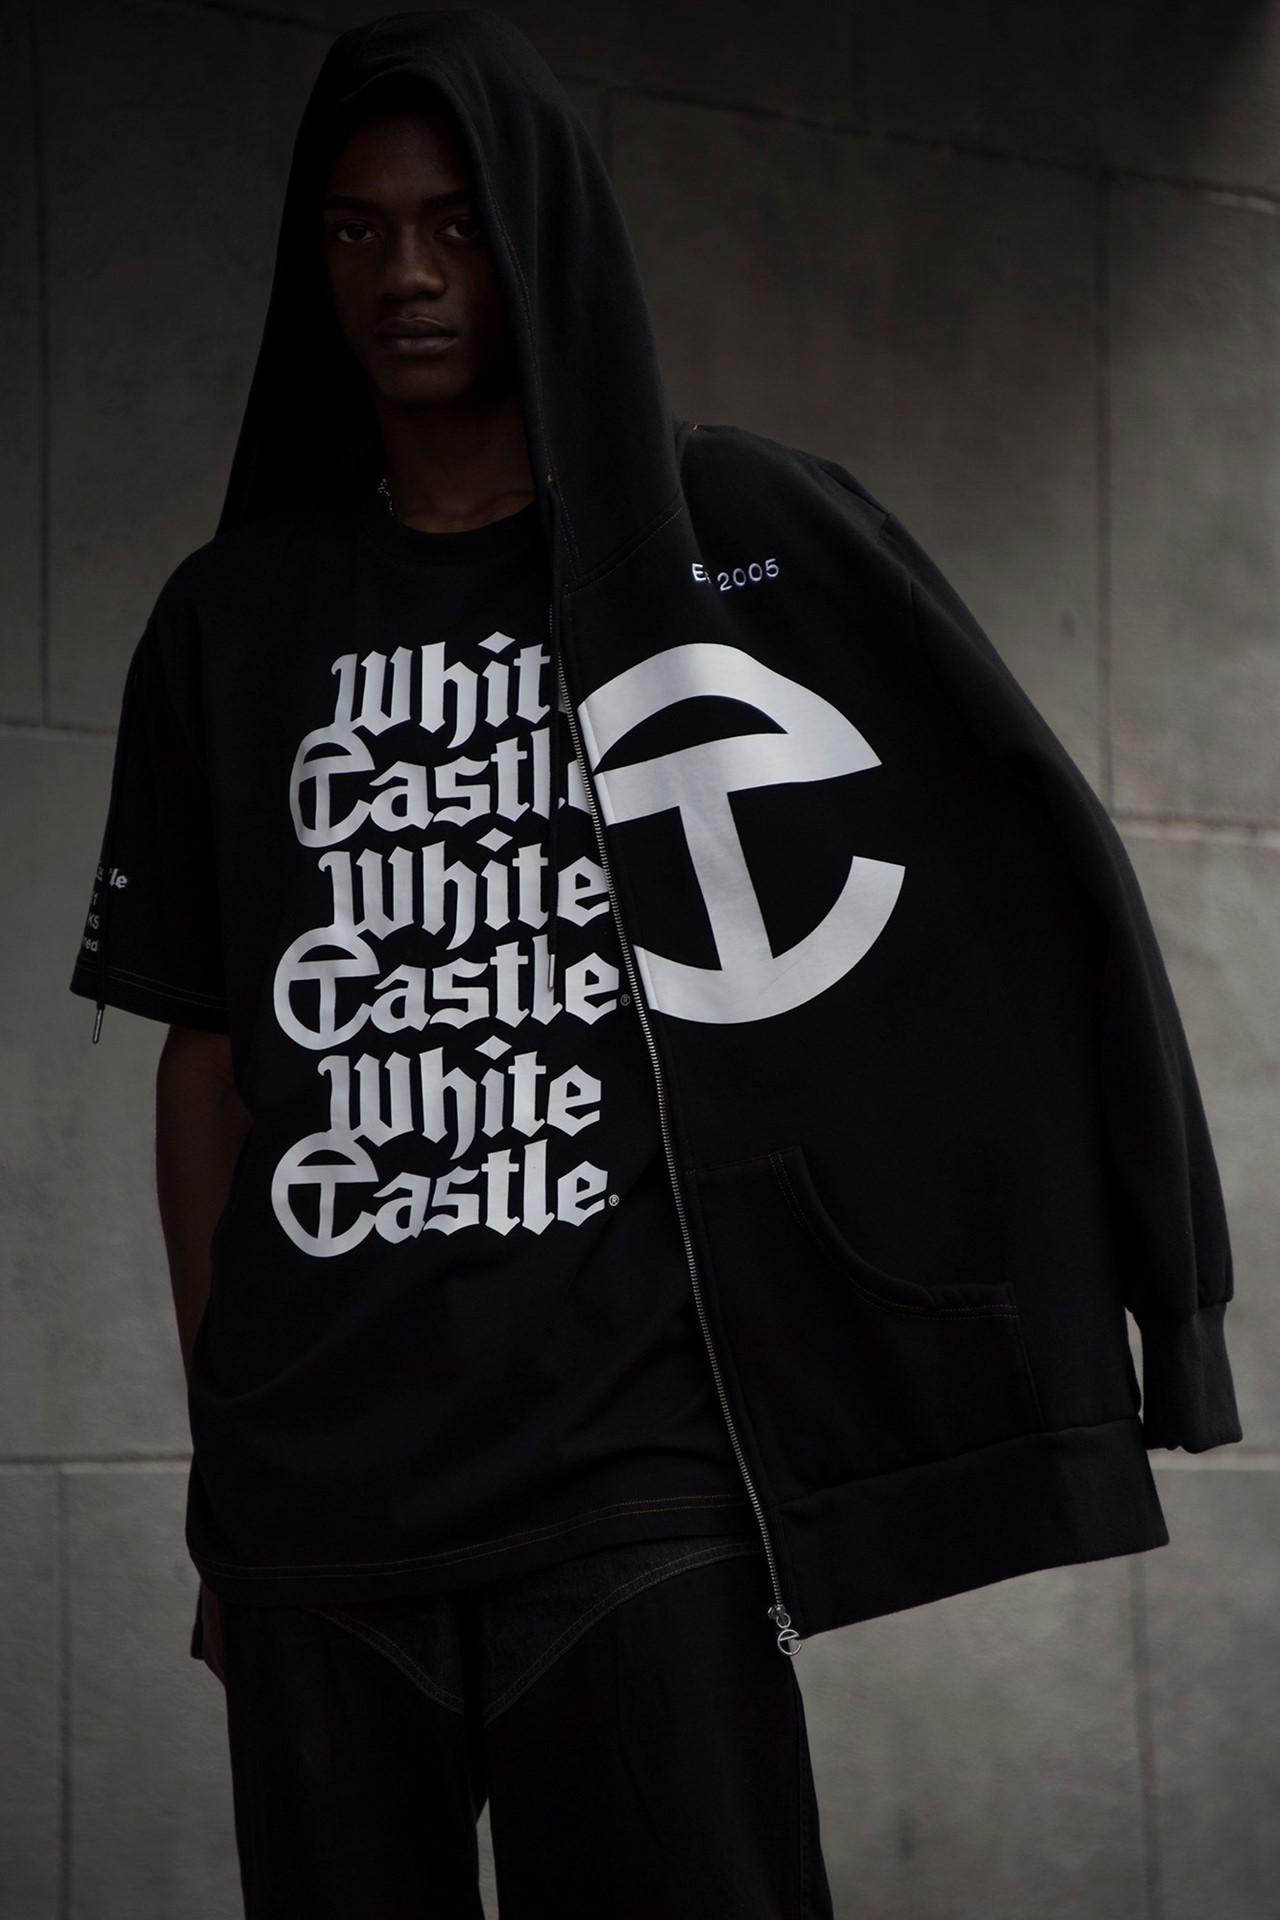 telfar-white castle-dtf-magazine-6